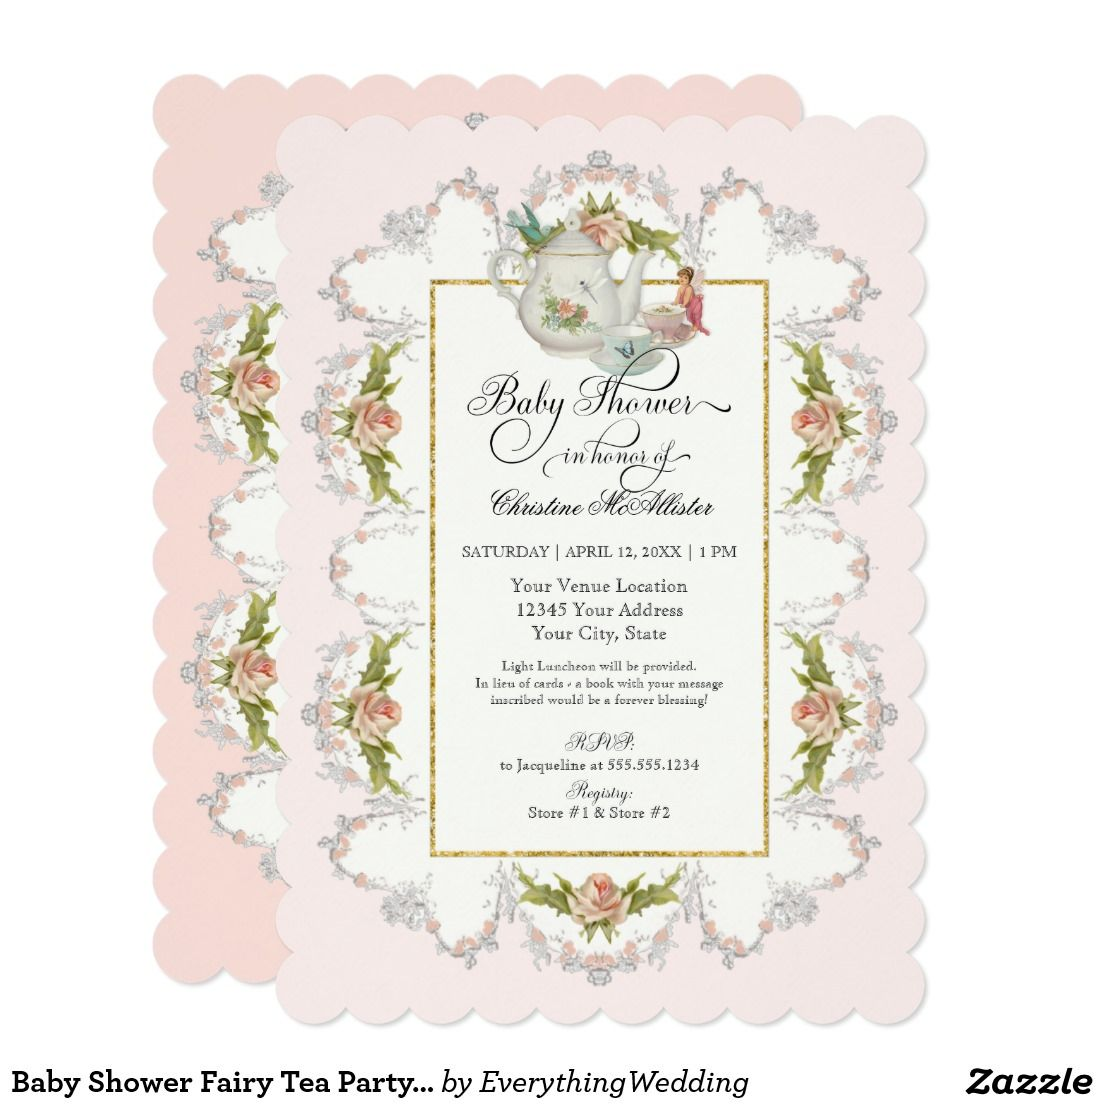 create your own invitation  zazzle  fairy tea